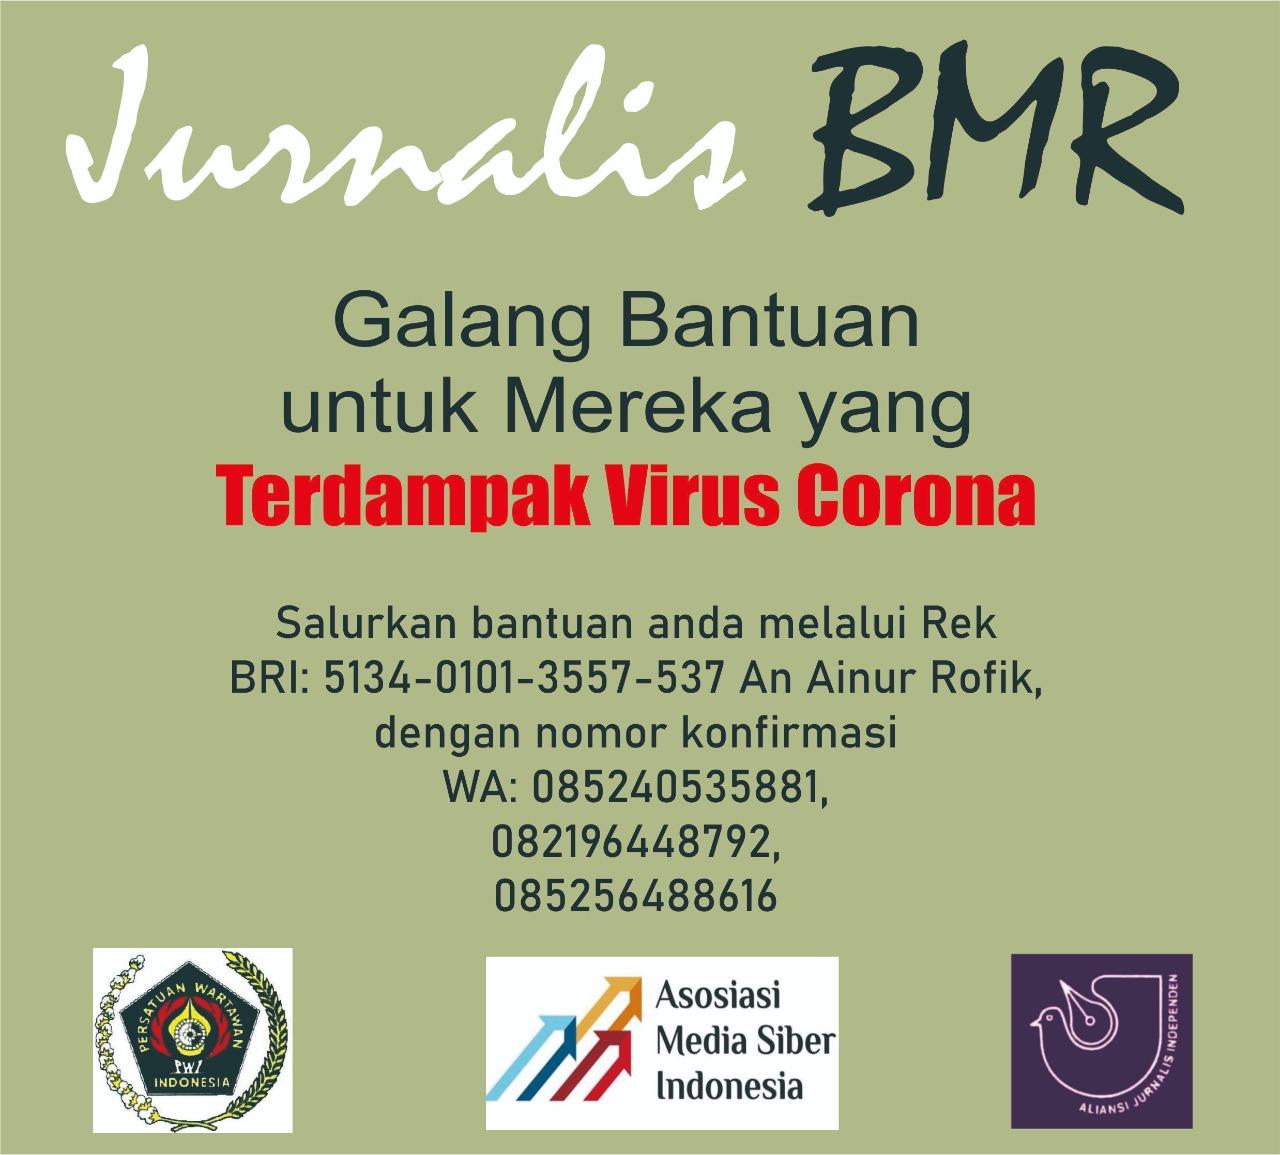 Jurnalis BMR Galang Bantuan untuk Warga Terdampak Covid-19